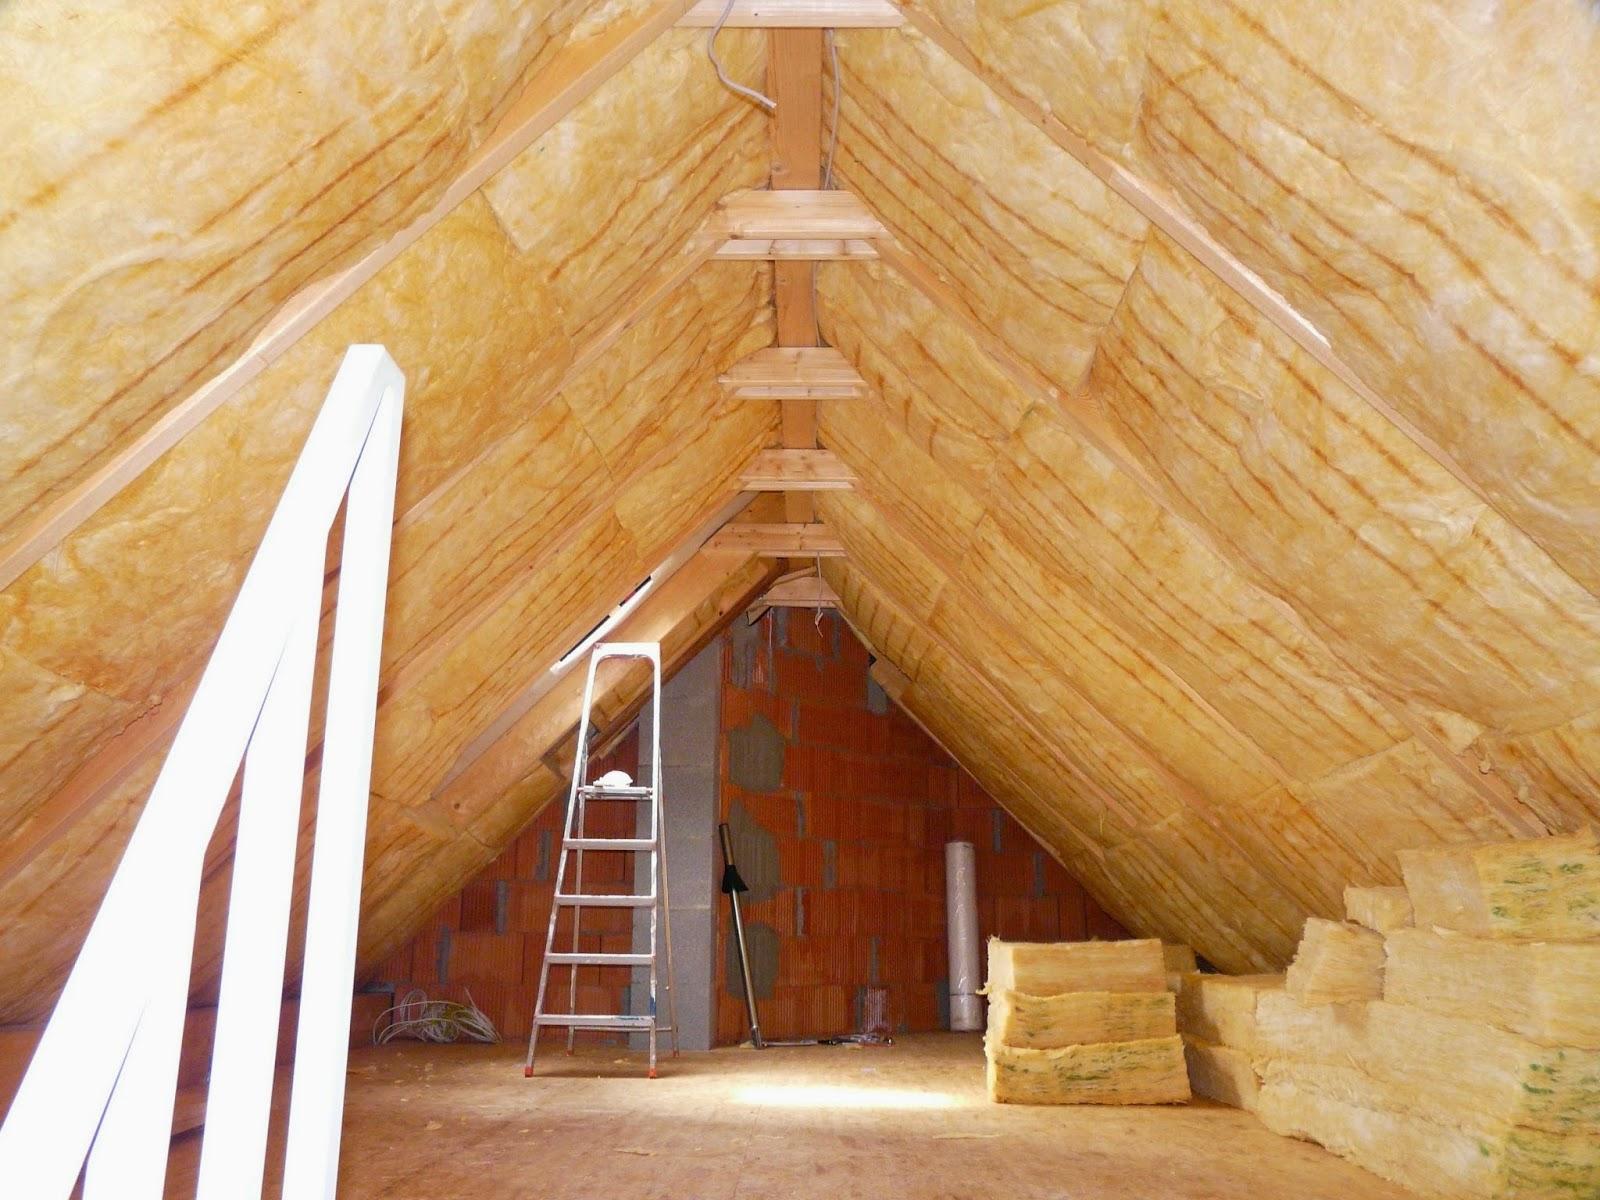 fibav haus hs bau bautagebuch anschlusssch chte buddeln dachbodenausbau 2. Black Bedroom Furniture Sets. Home Design Ideas